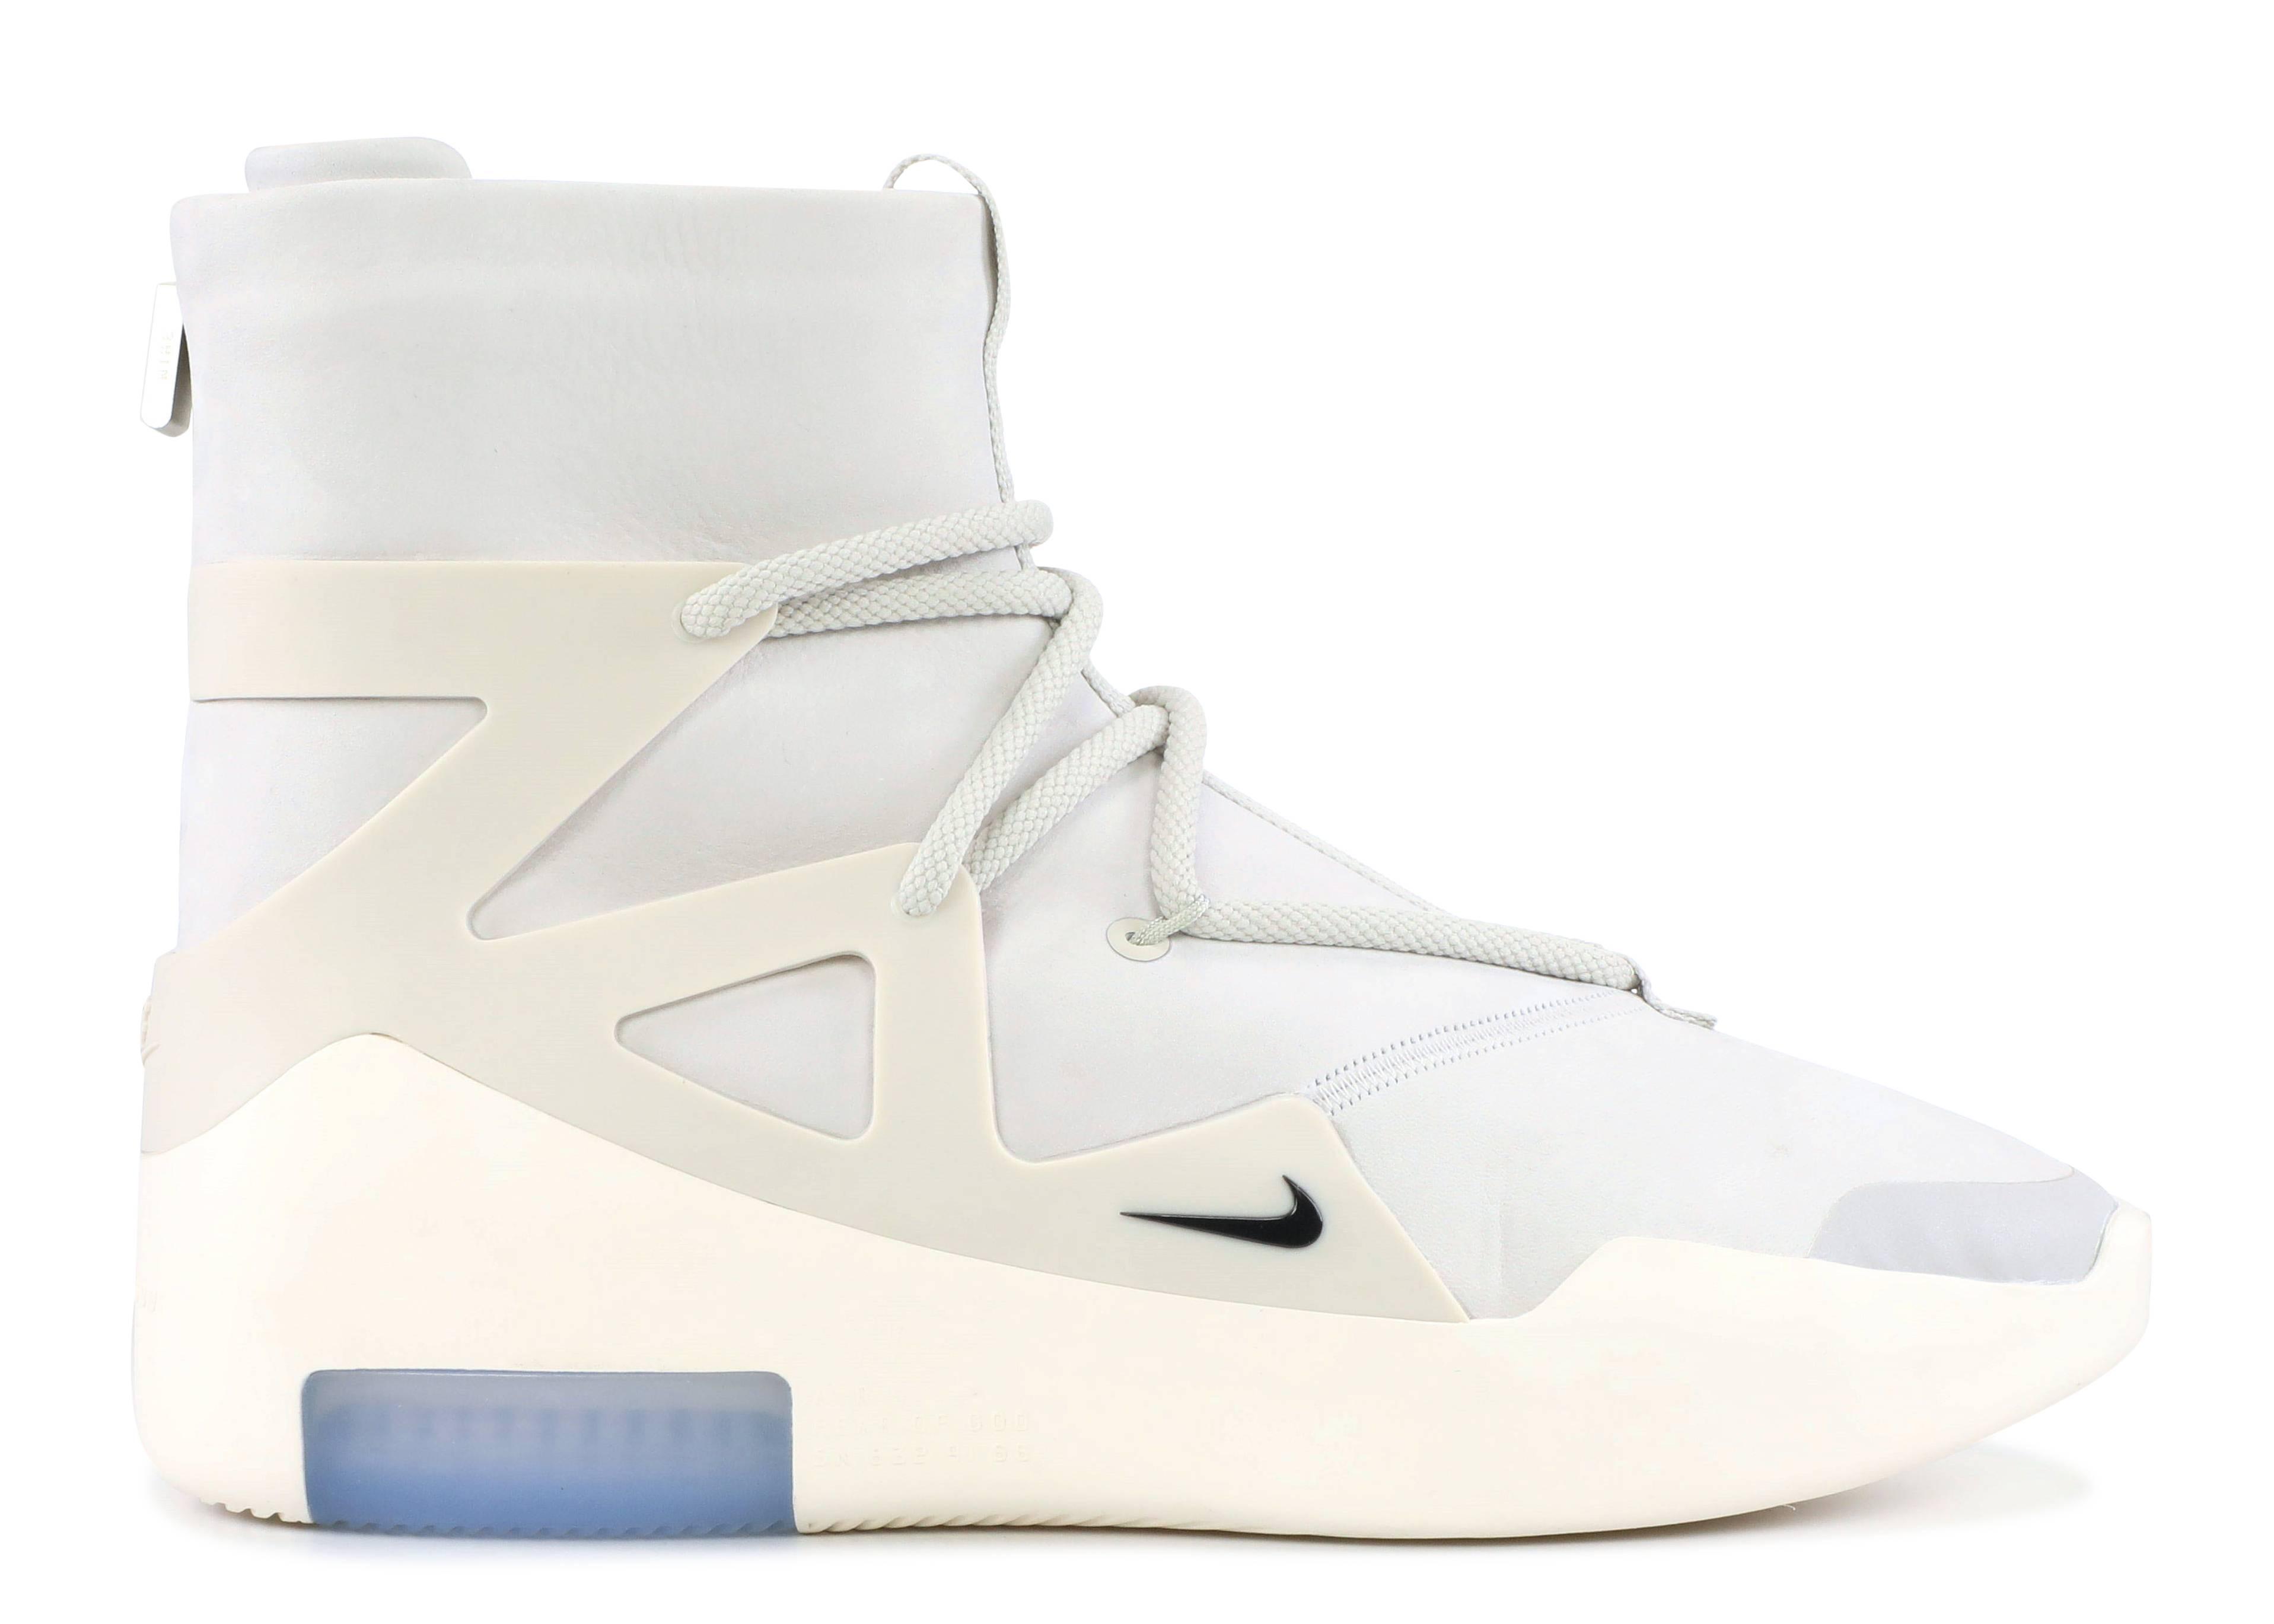 Nike Air Fear Of God 1 'Light BoneBlack' AR4237 002 Release